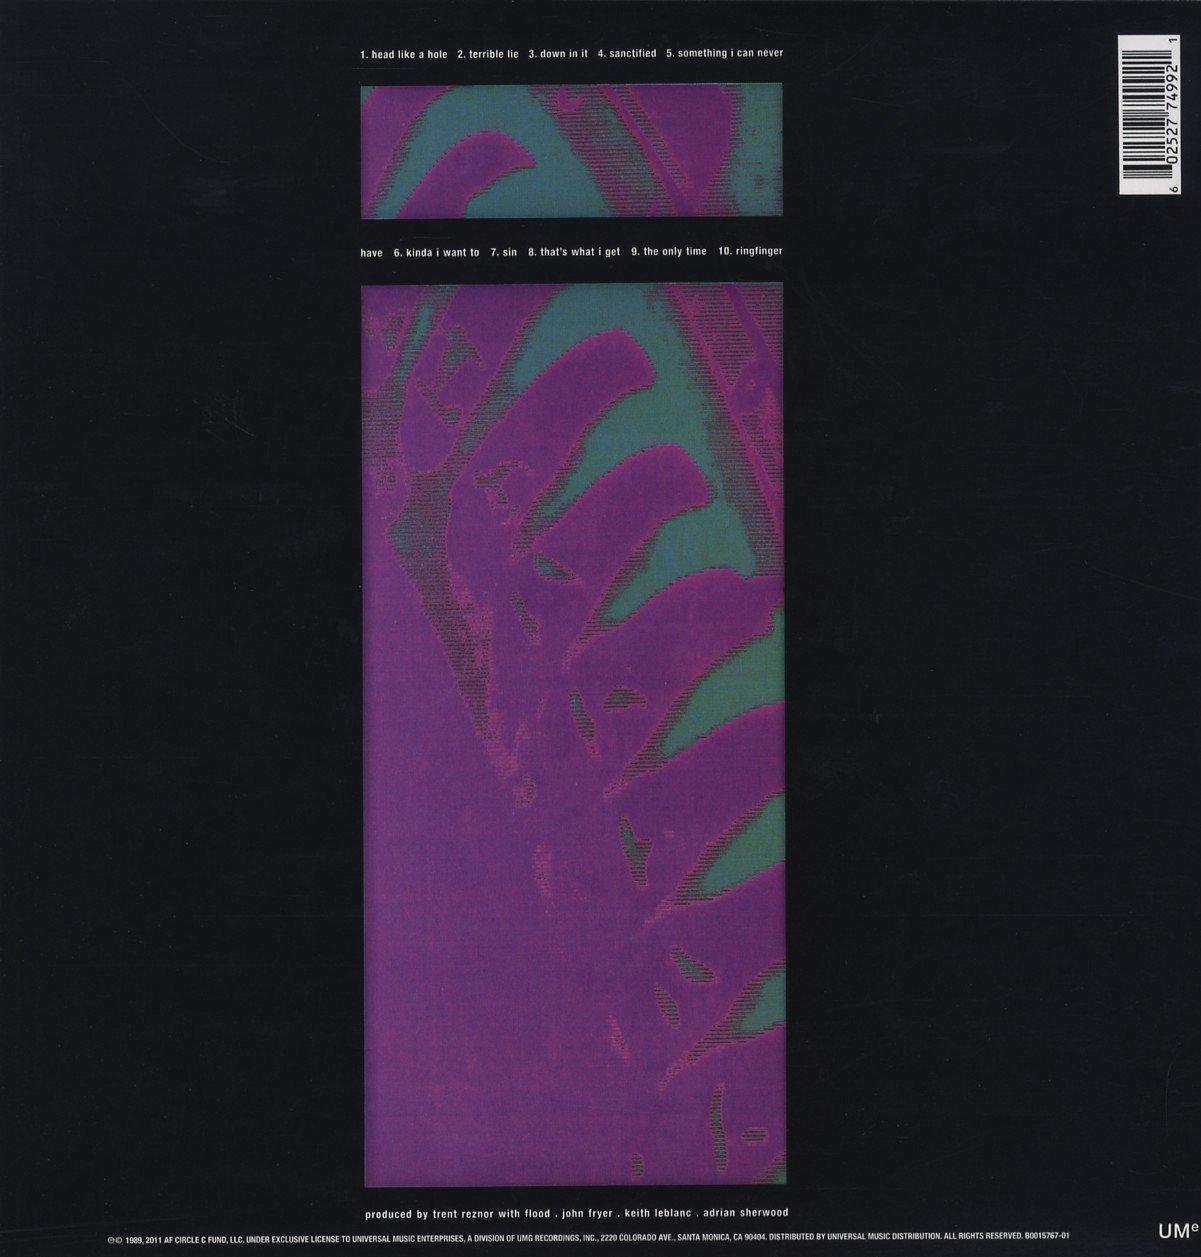 Nine Inch Nails - Pretty Hate Machine [LP] - Amazon.com Music